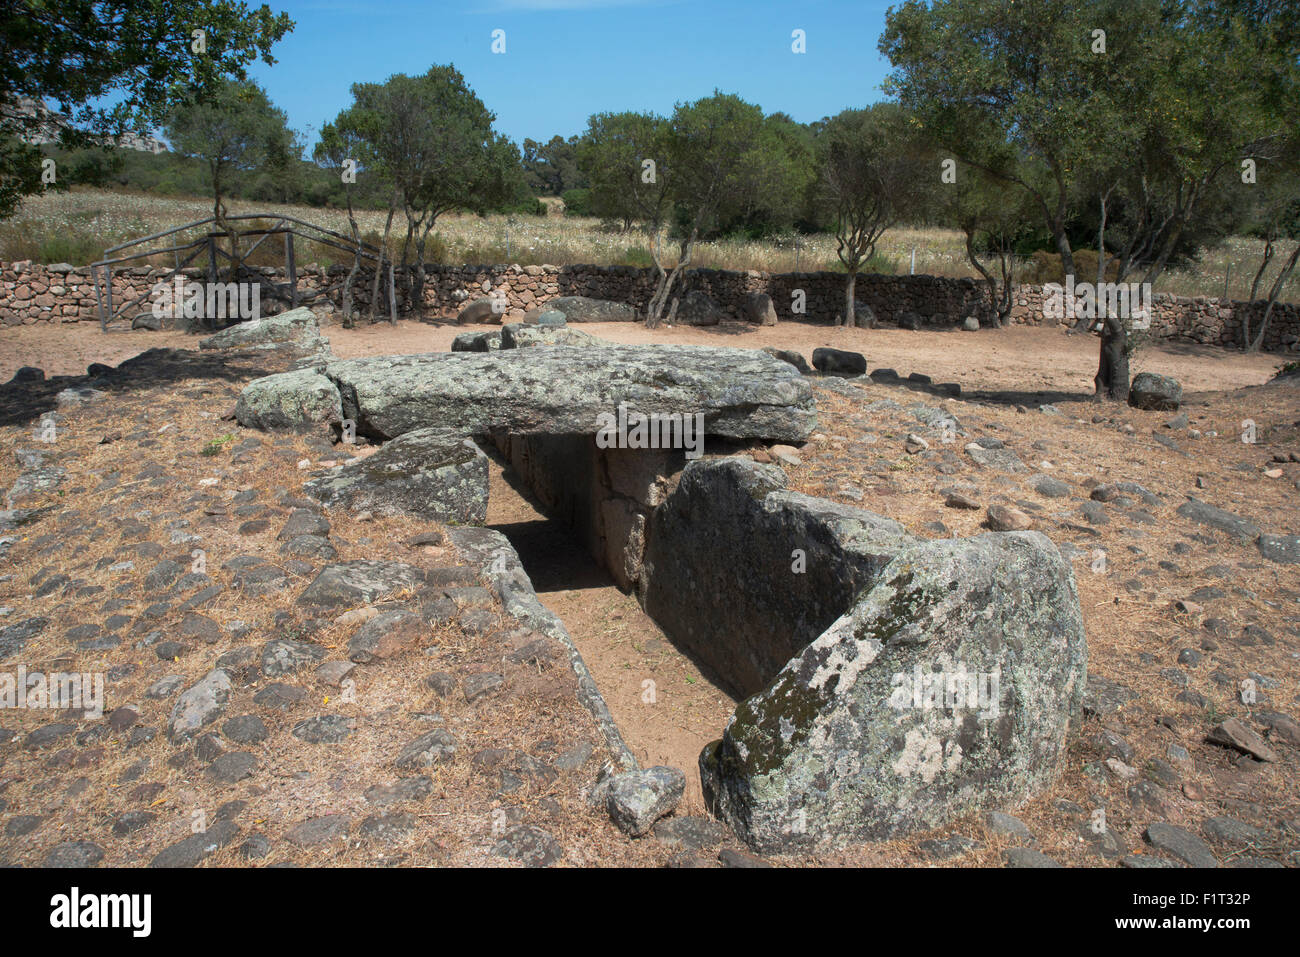 Tomba di Giganti Moru later changed into the Tomb of the Giants, Arzachena, Sardinia, Italy - Stock Image